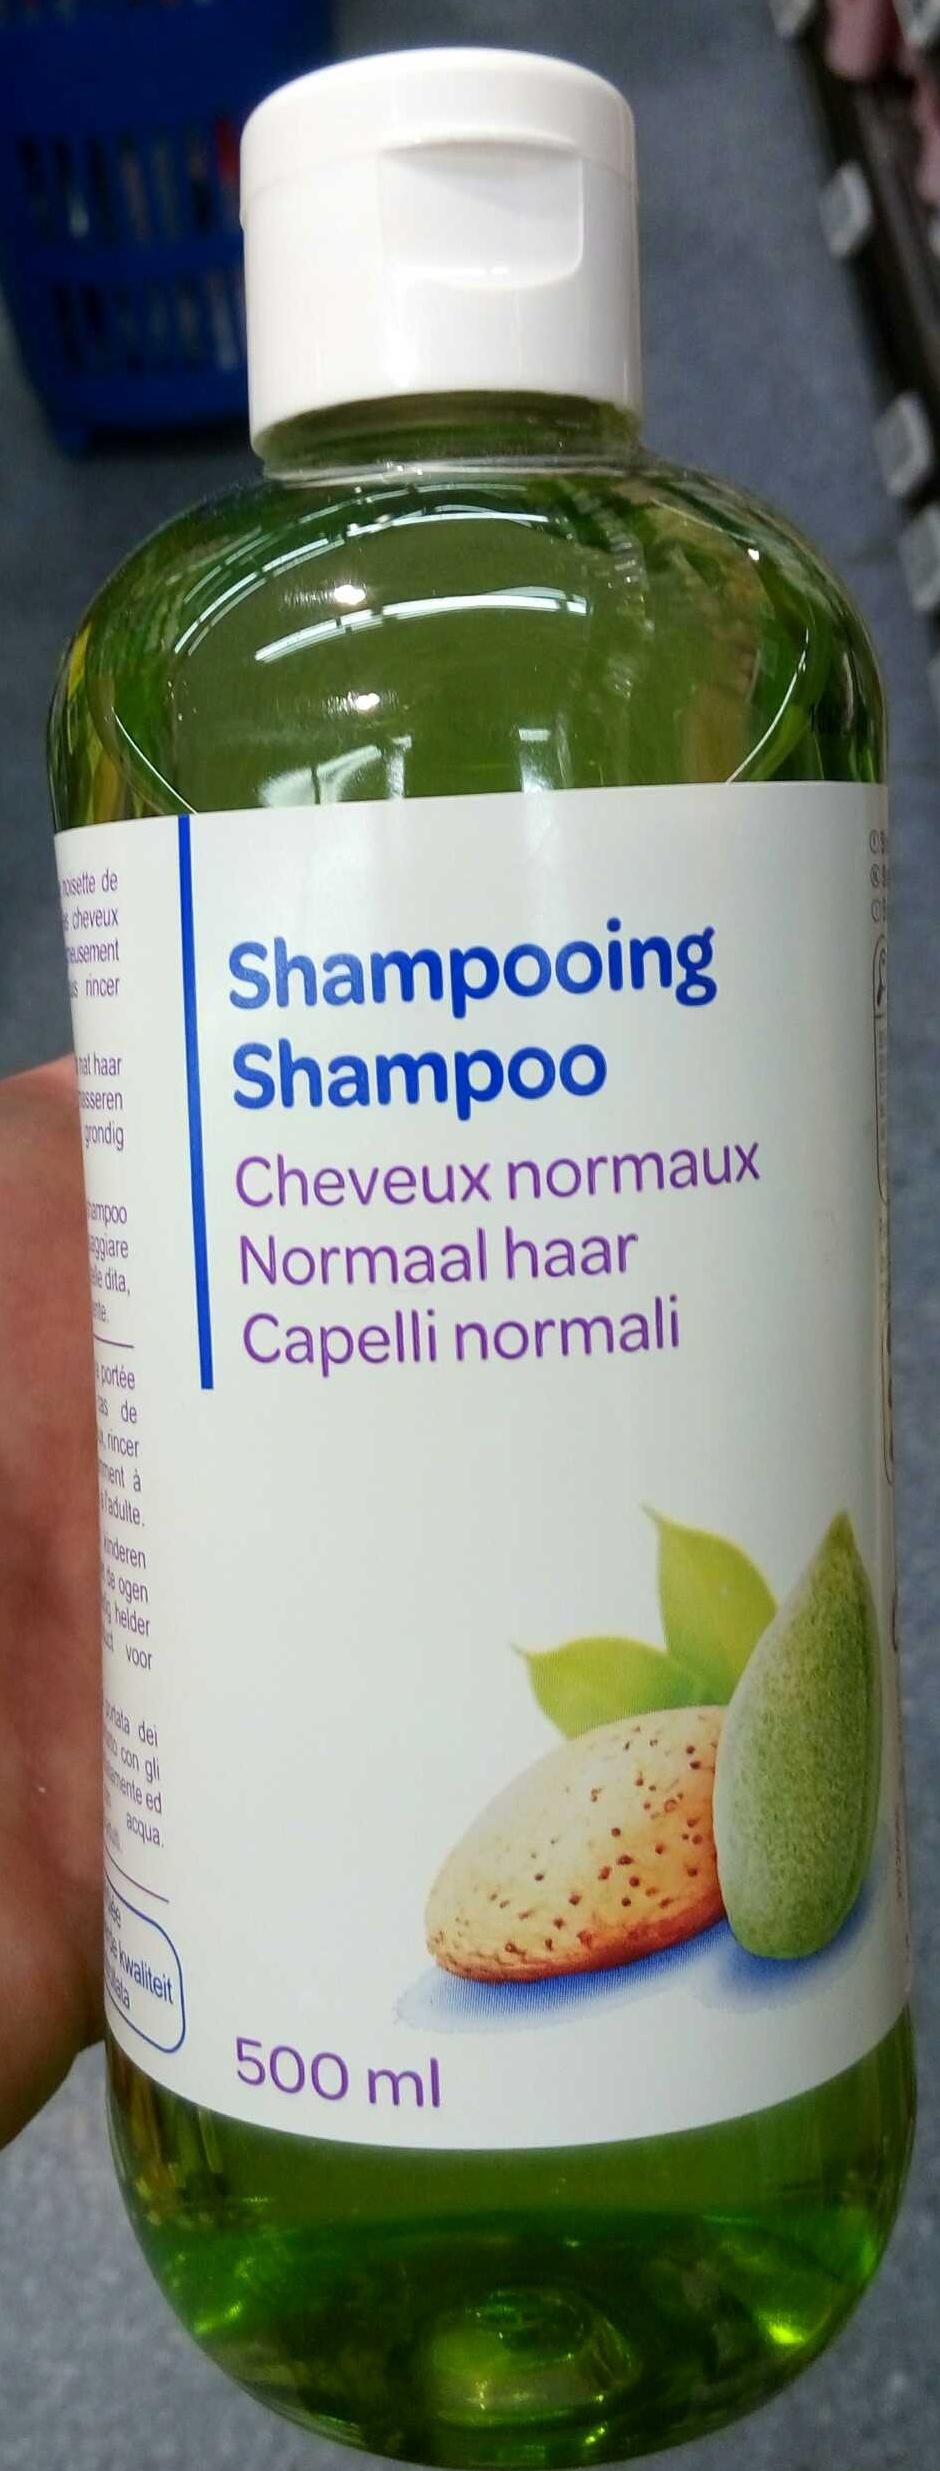 Shampooing cheveux normaux - Produit - fr